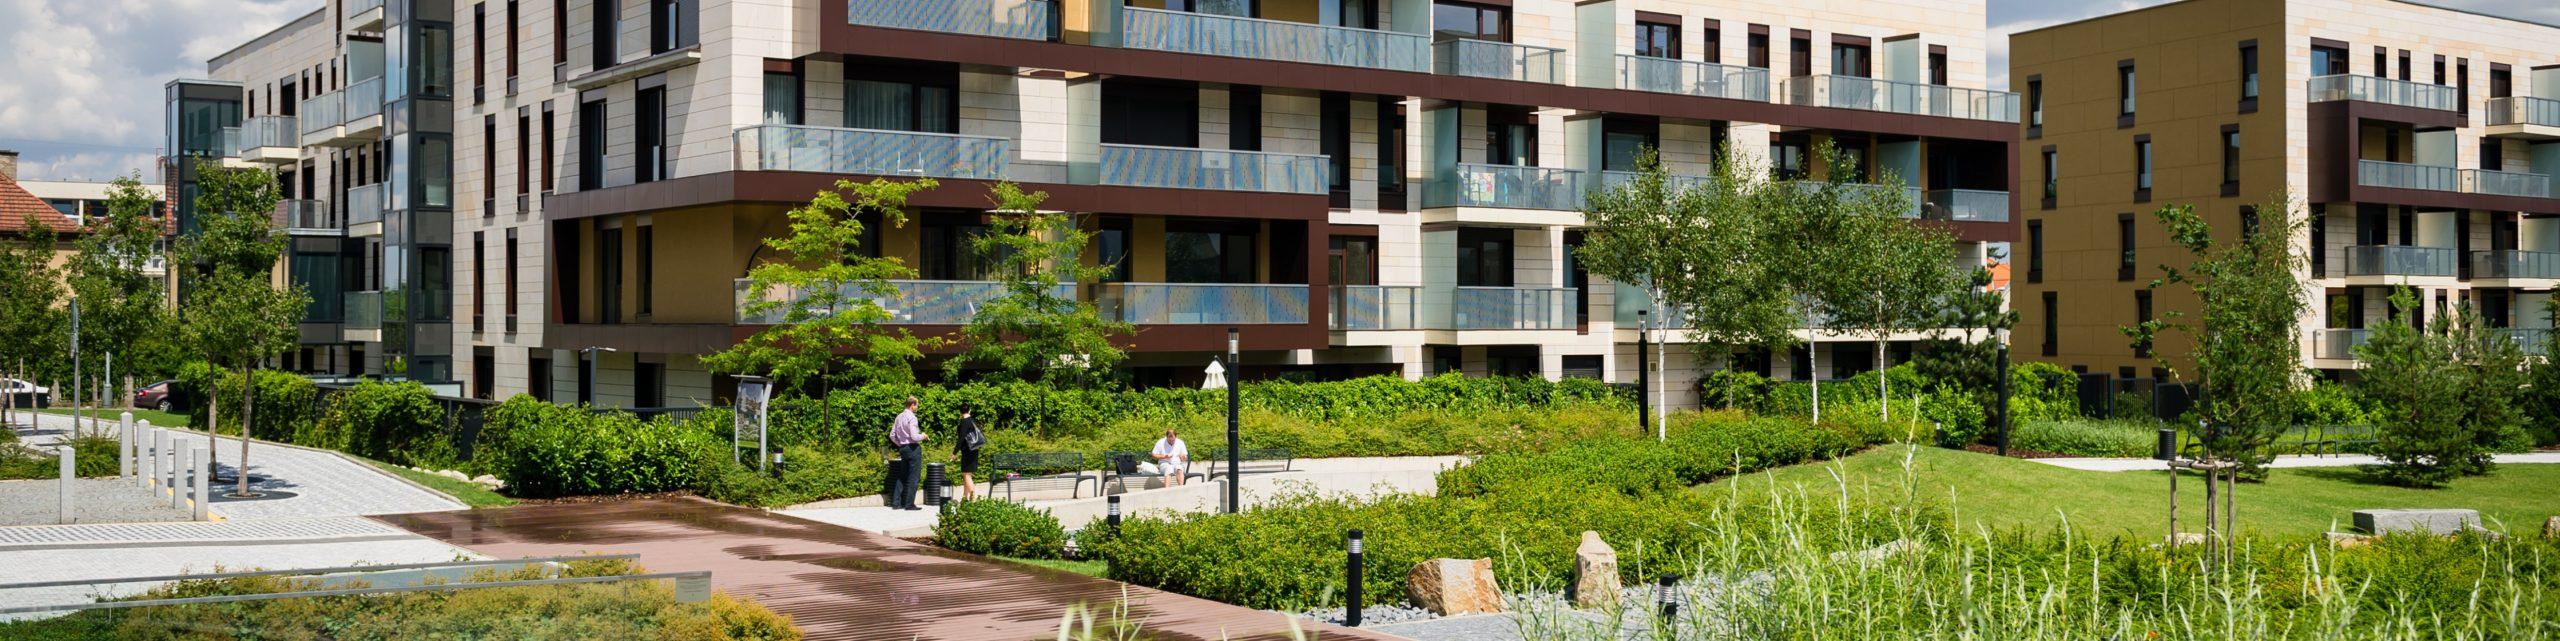 Designing density: multi-family design guidelines for social  - Apartment Design Guidelines